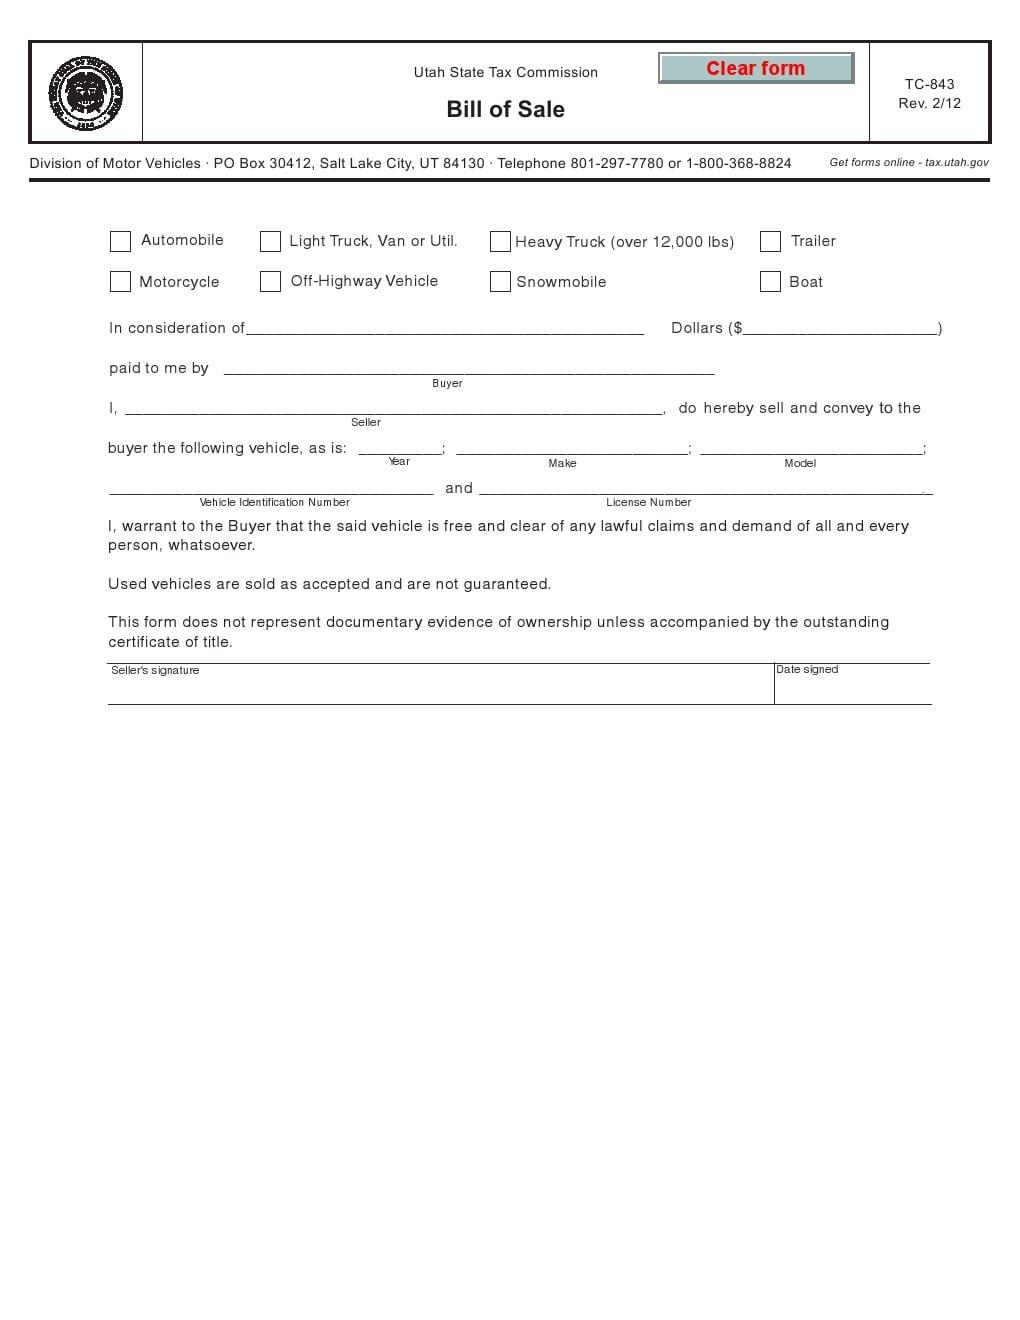 Download Free Utah Bill Of Sale Form Tc 843 Form Download Utah automobile bill of sale